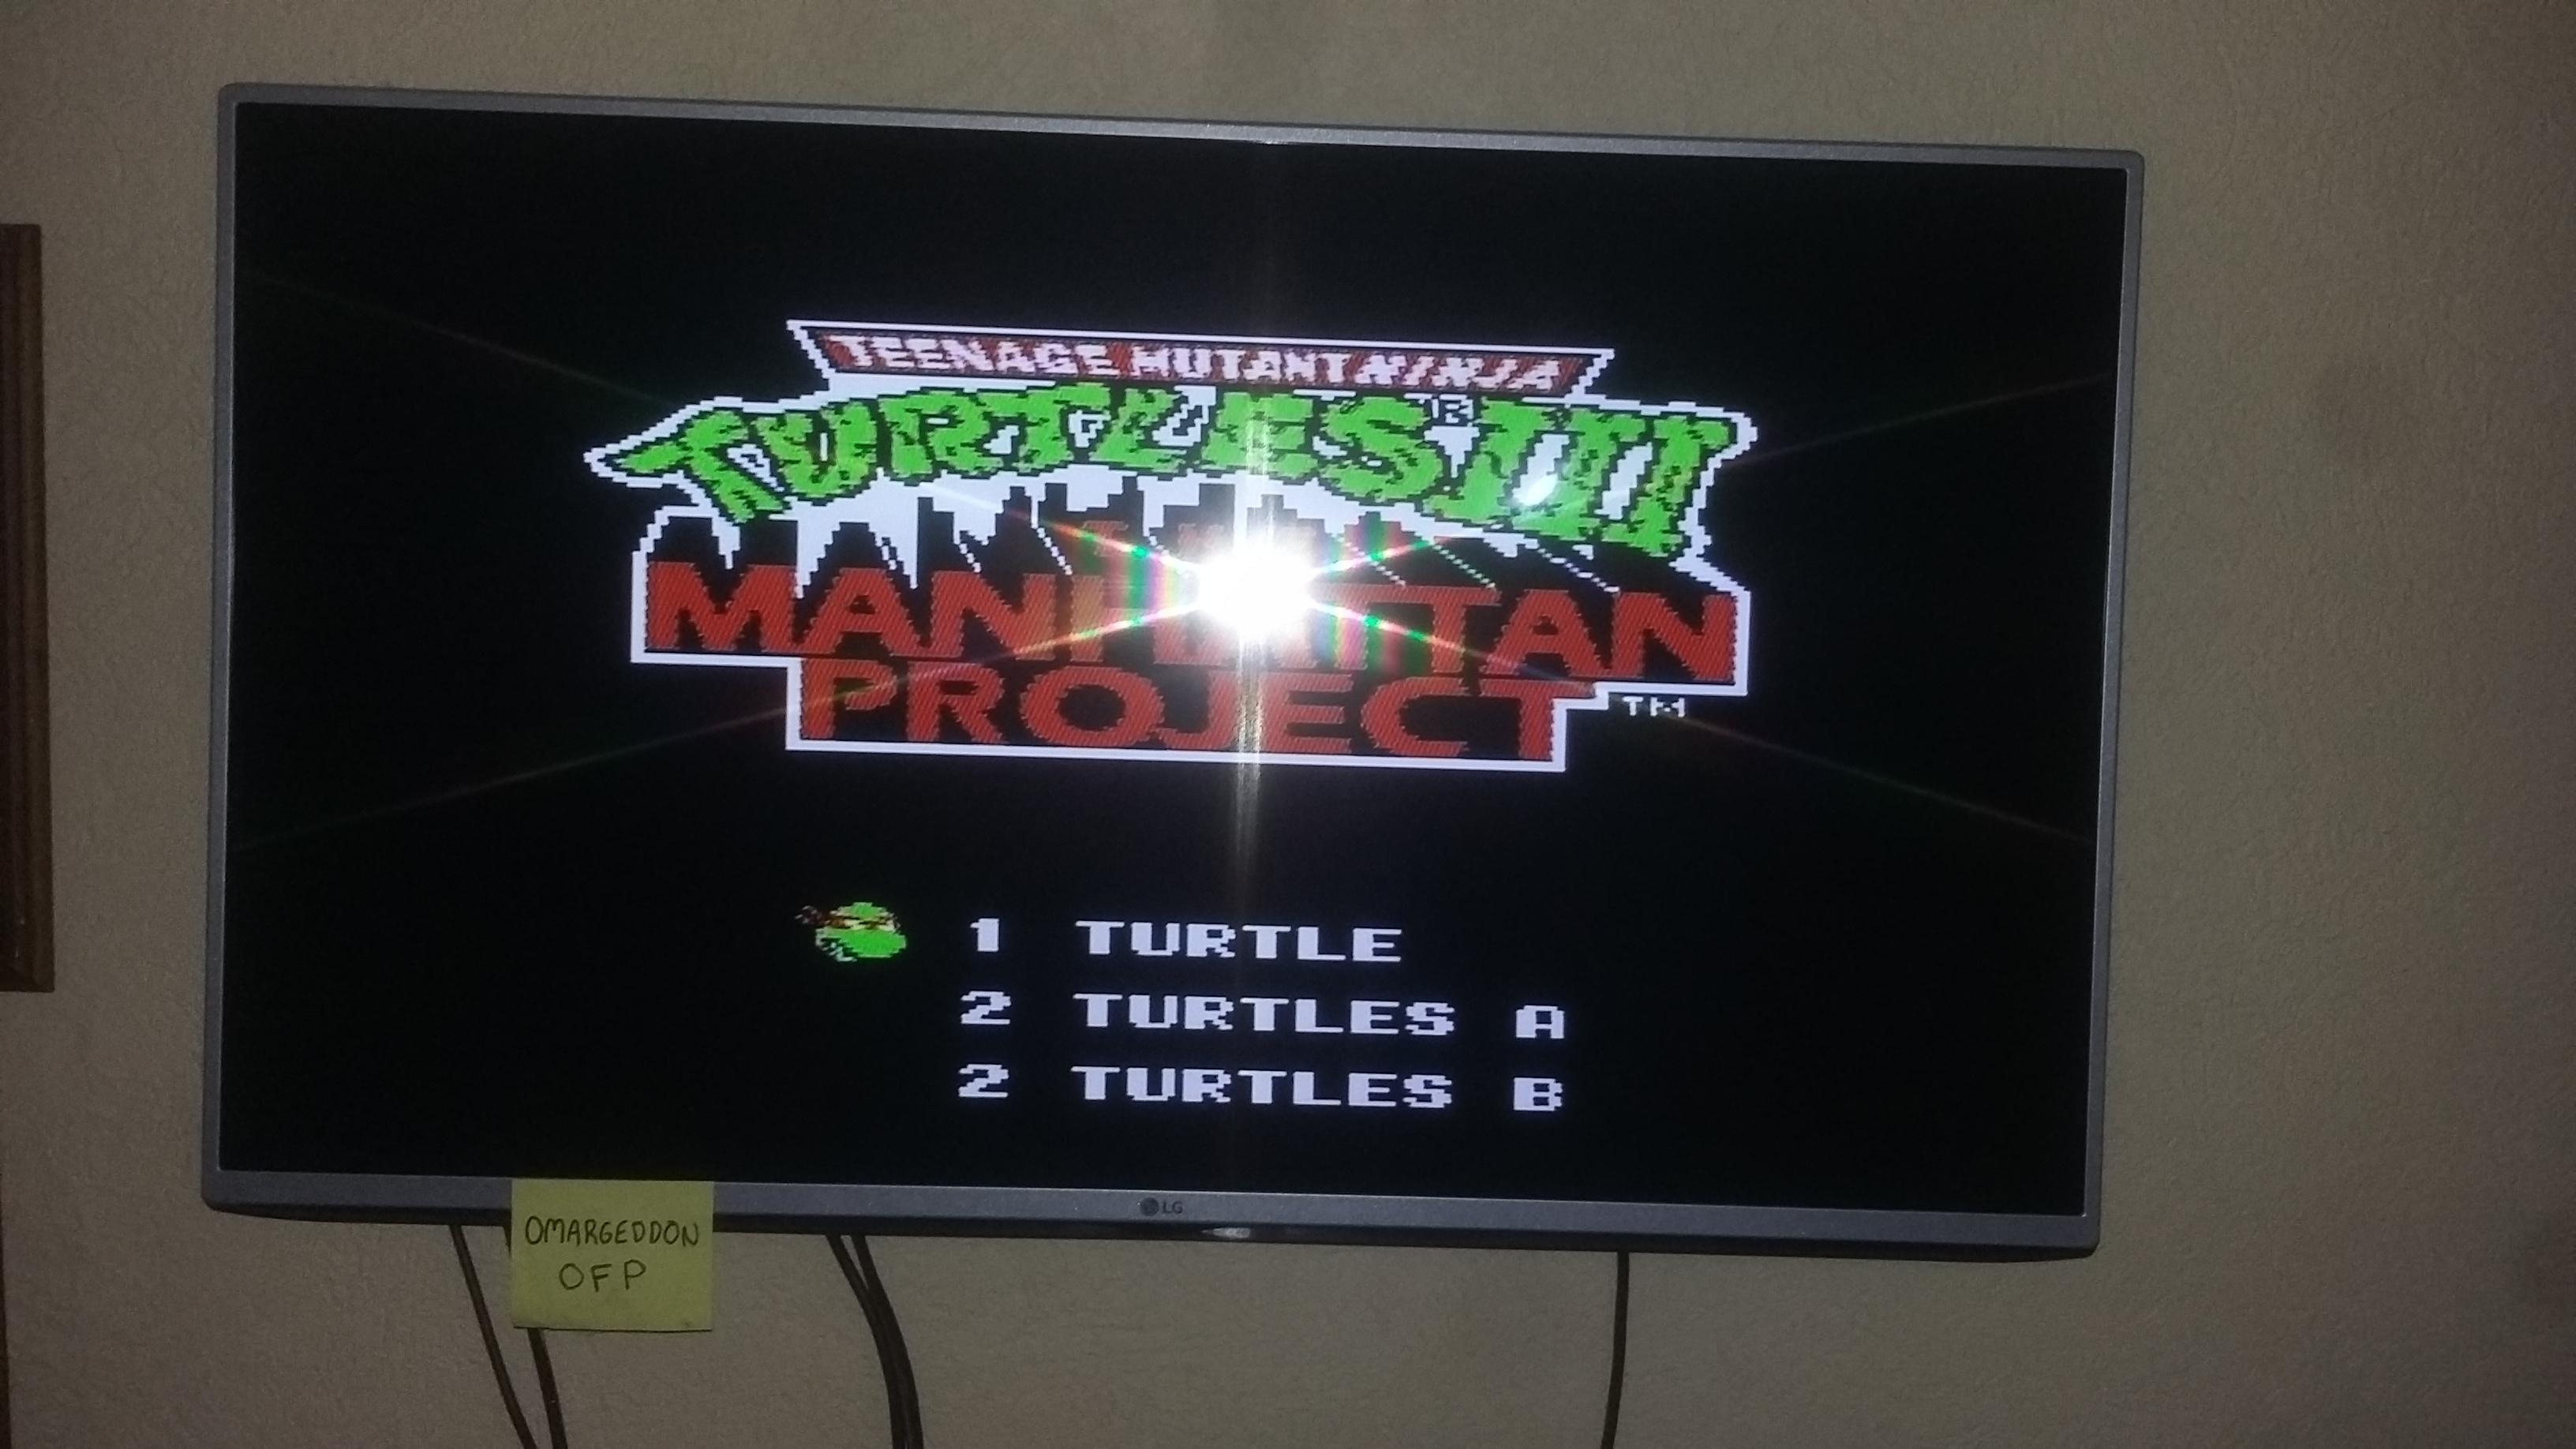 Teenage Mutant Ninja Turtles 3: The Manhattan Project 32,000 points